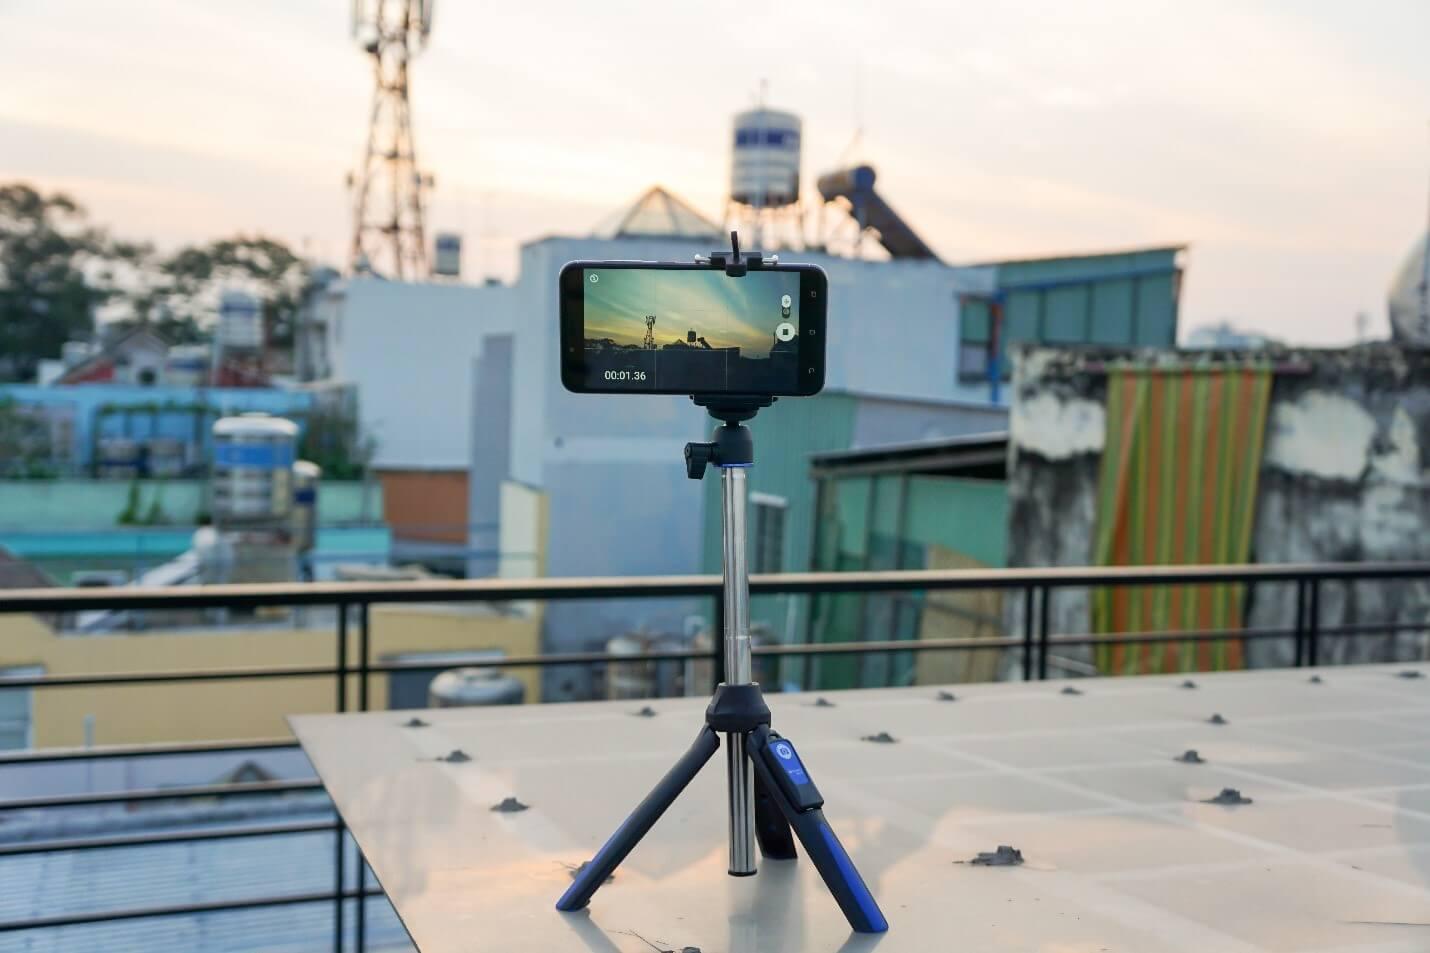 sử dụng tripod khi quay phim